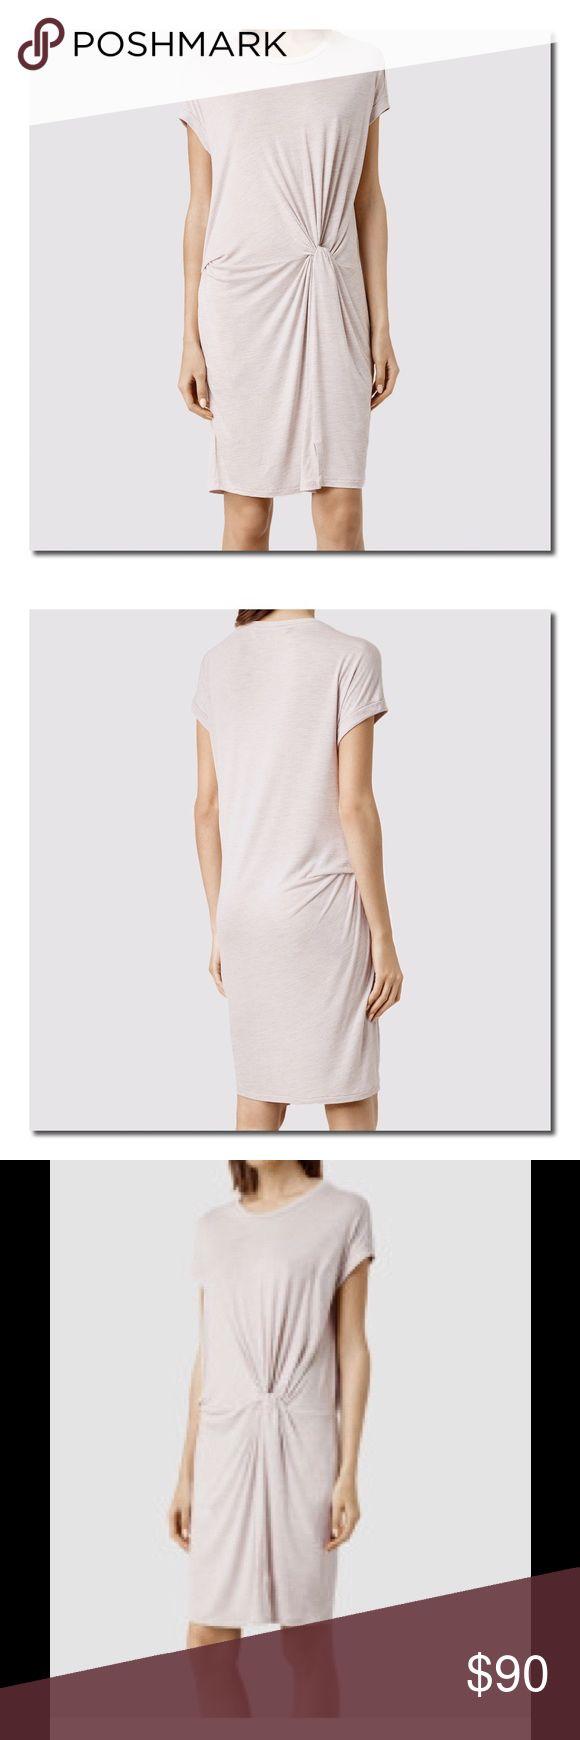 All Saints Dress All Saints Mast Mar Dress -Ash 96% viscose, 4% polyester. Delicate wash. Made in: Portugal. All Saints Dresses